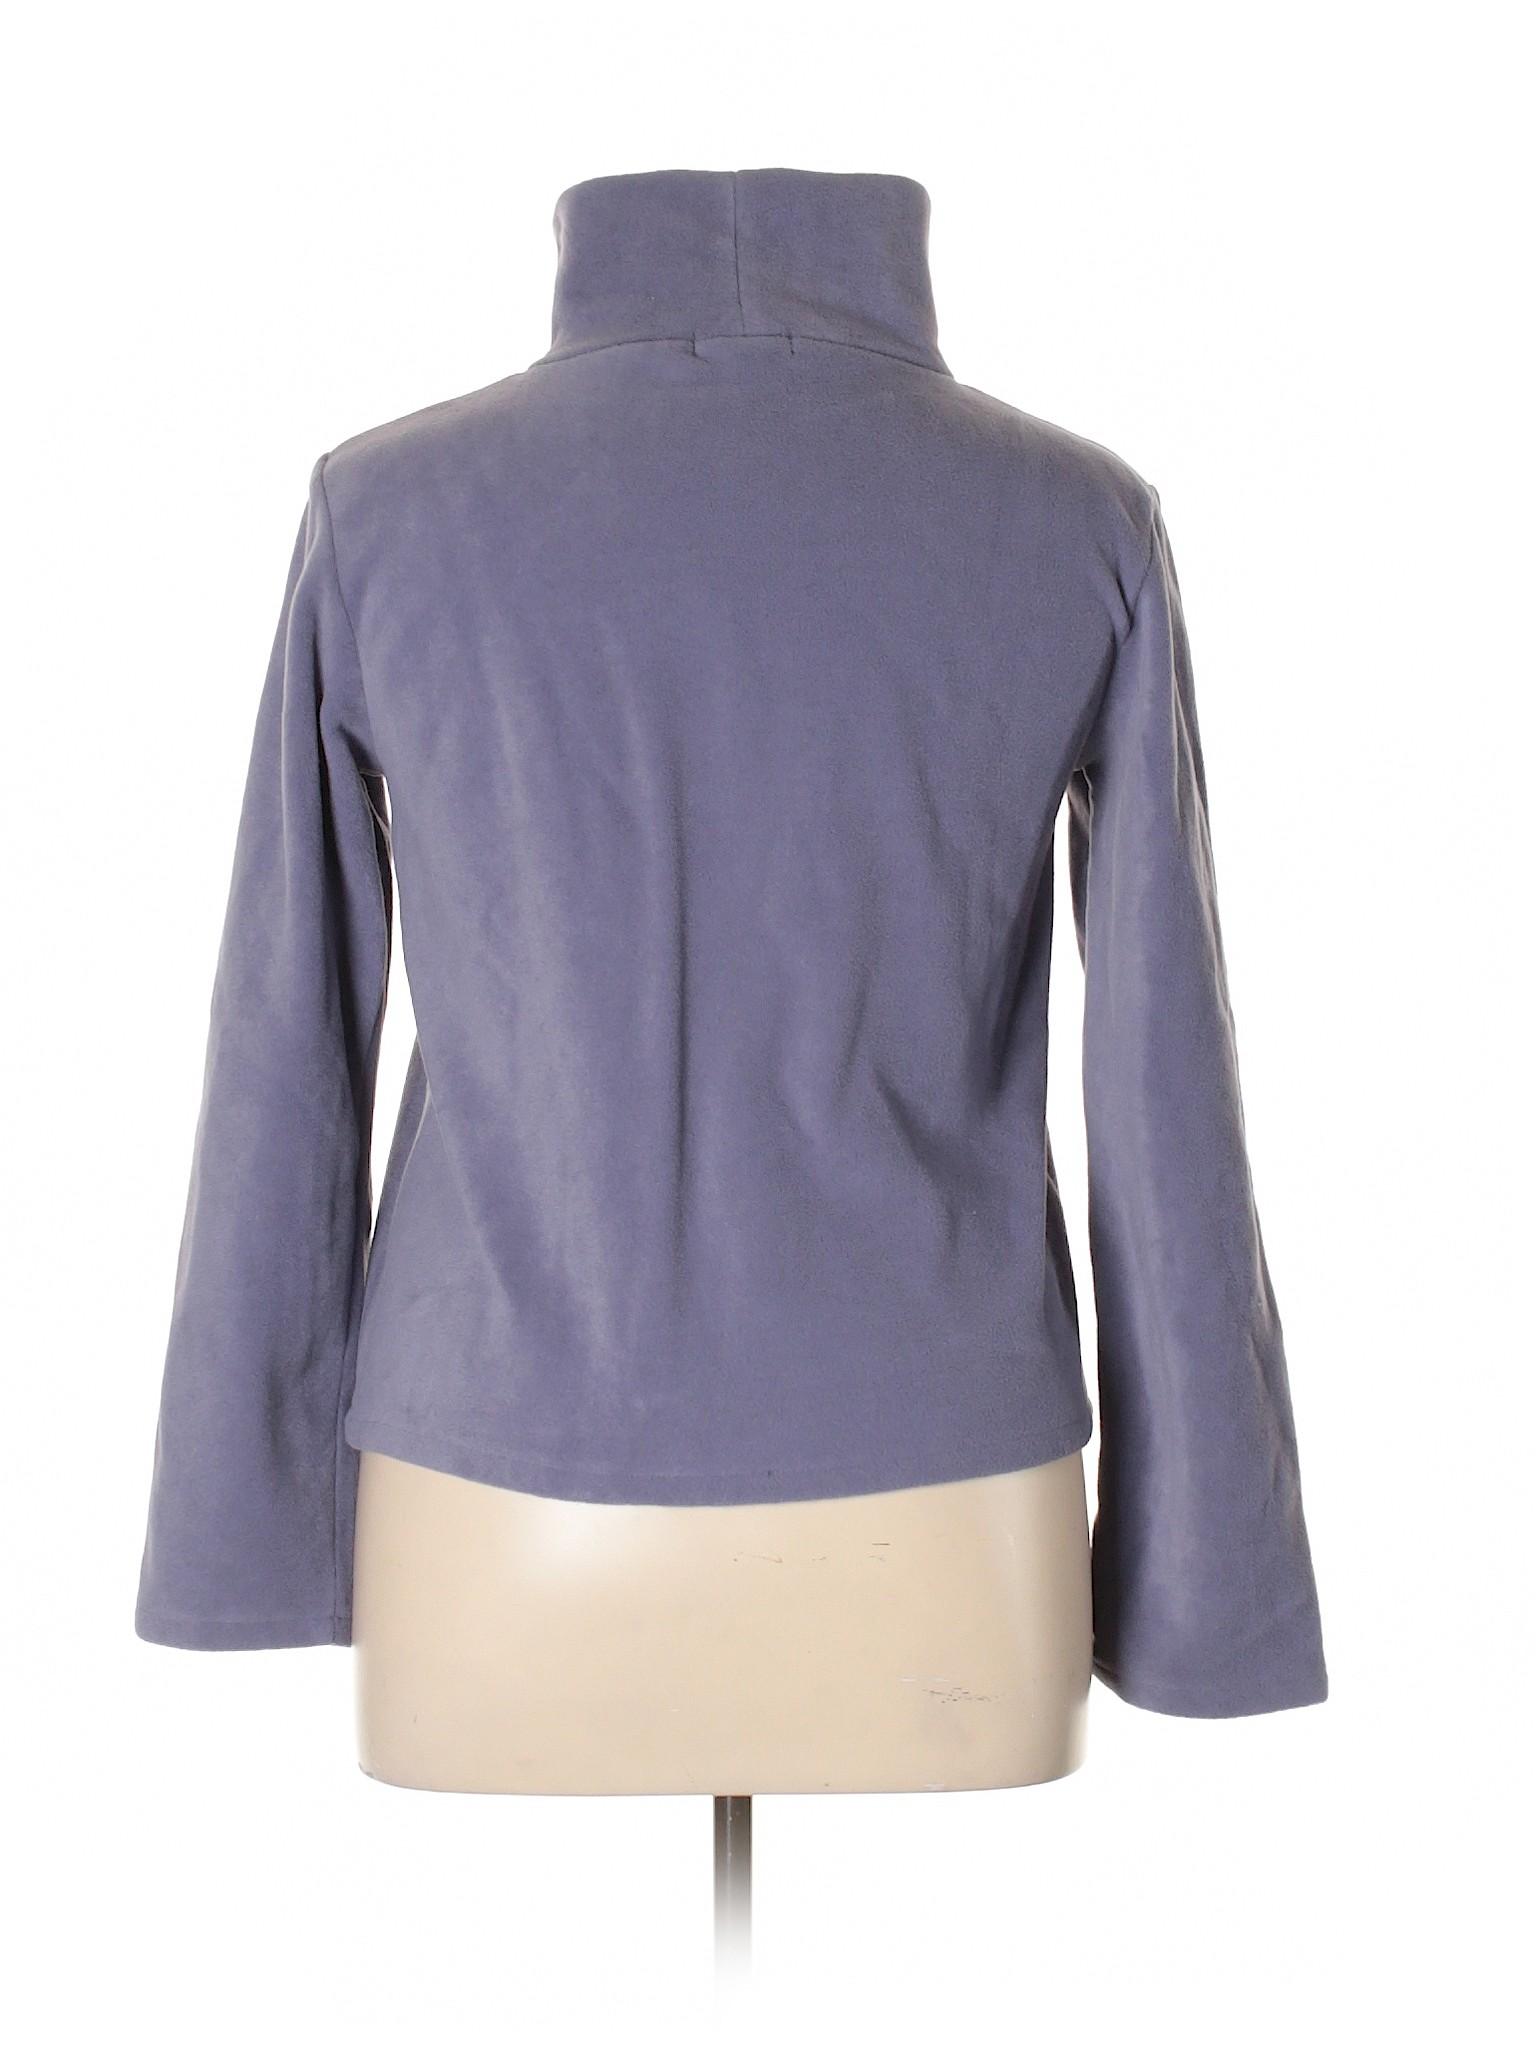 Boutique winter Sweater Pullover Republic Banana vvUwpqOBr